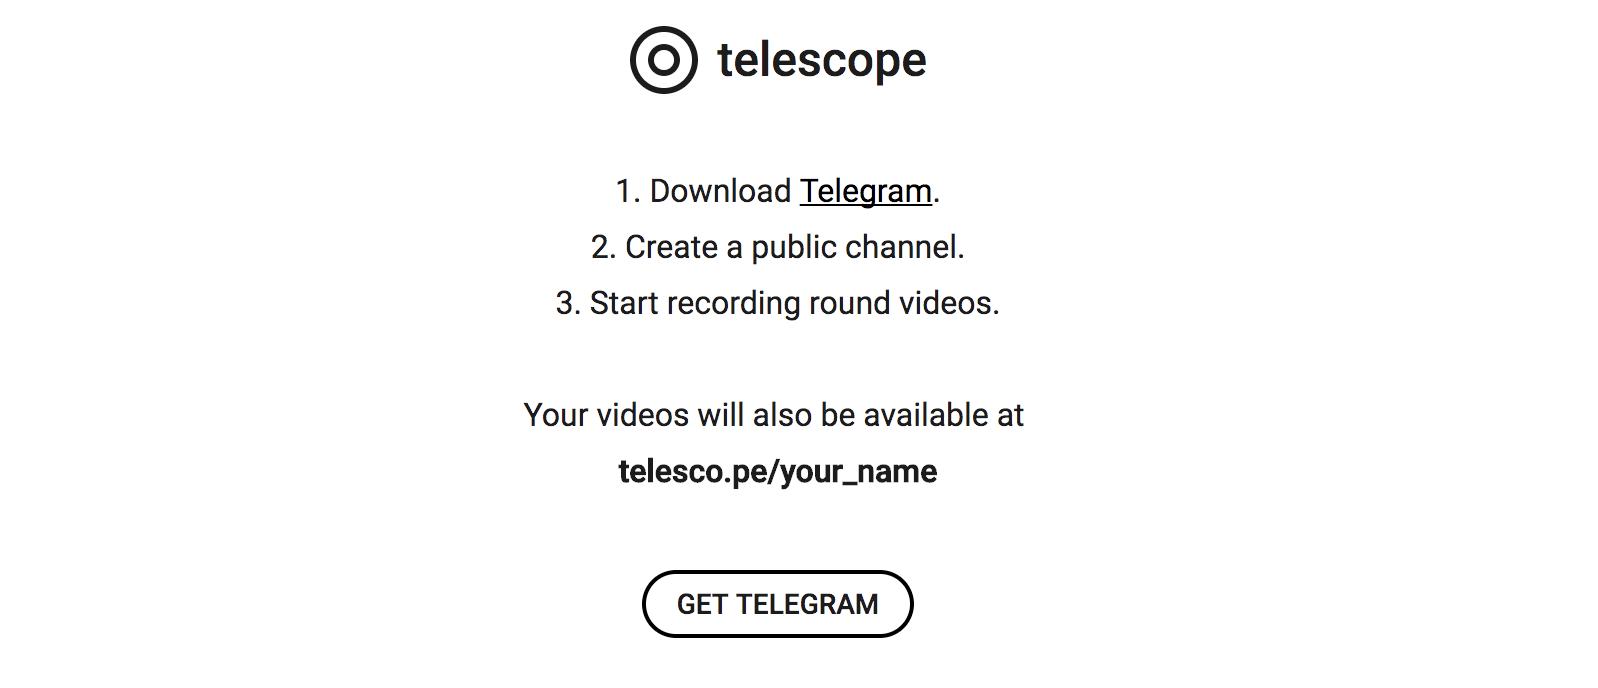 Telesco.pe